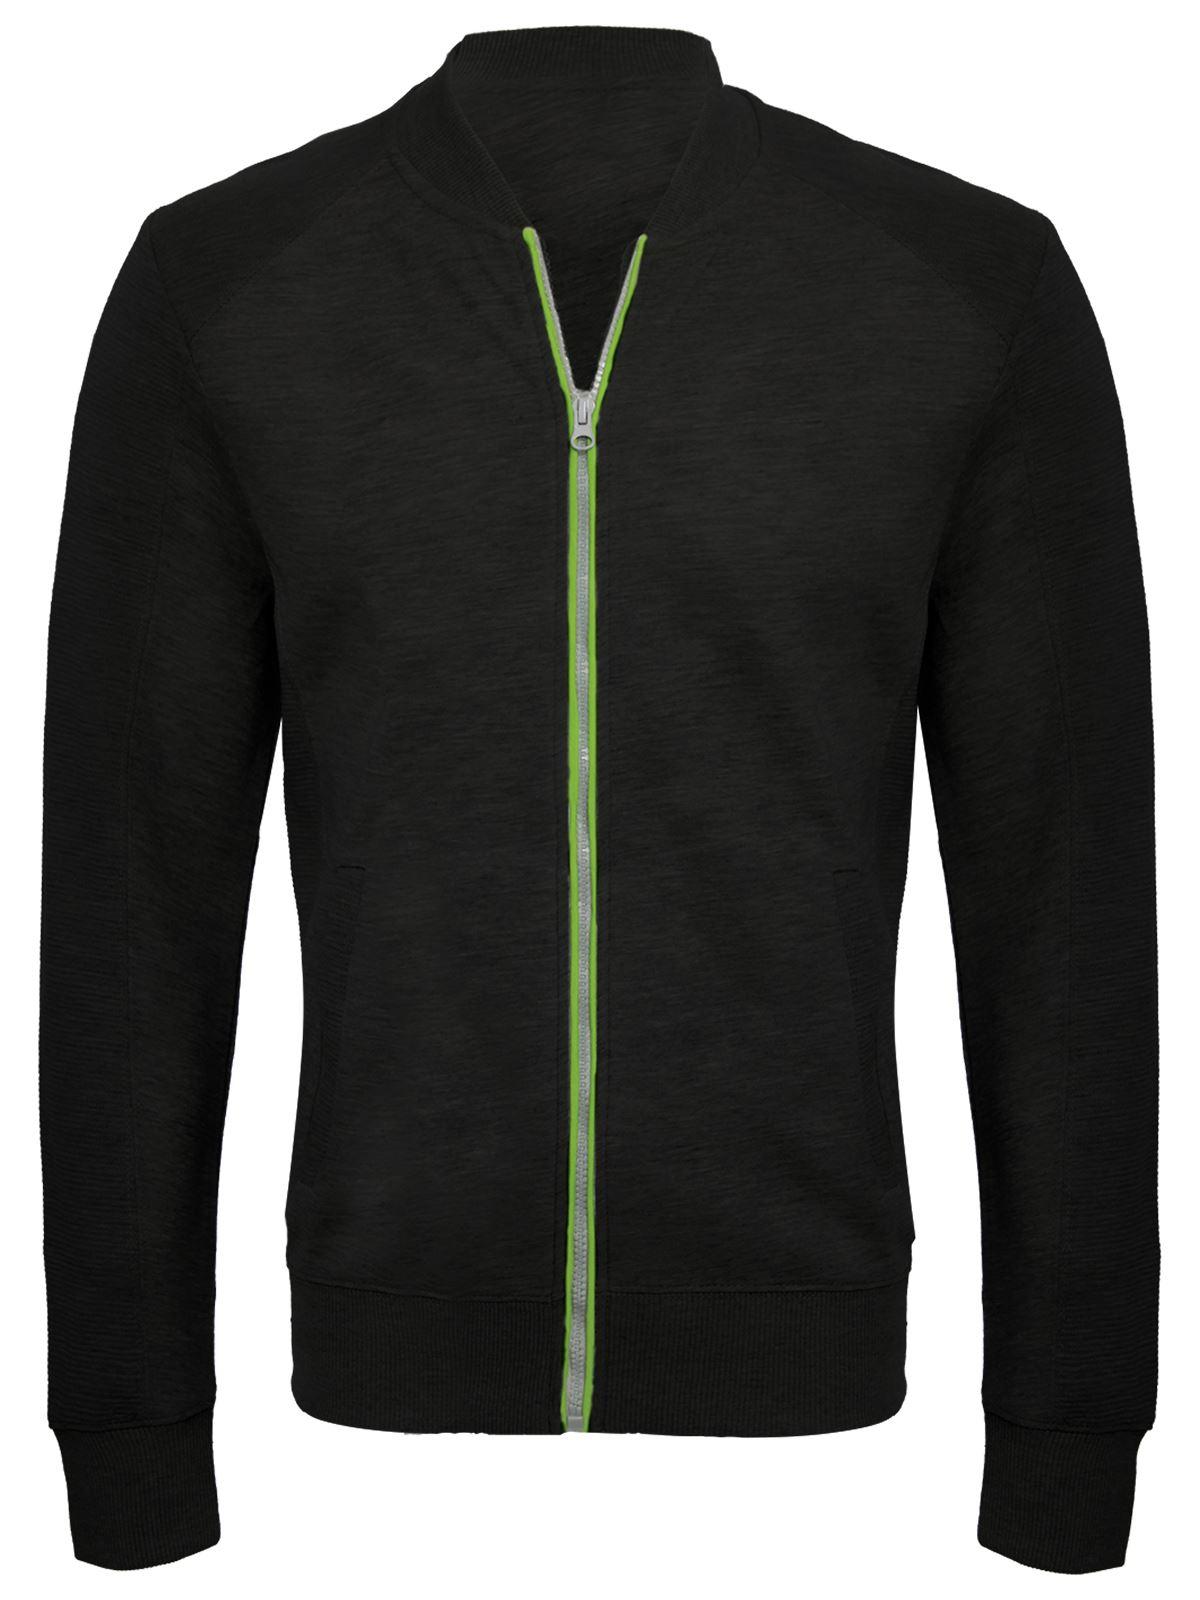 Mens Fleece Baseball Zip Up Jacket Sweatshirt Top Gym Training ...